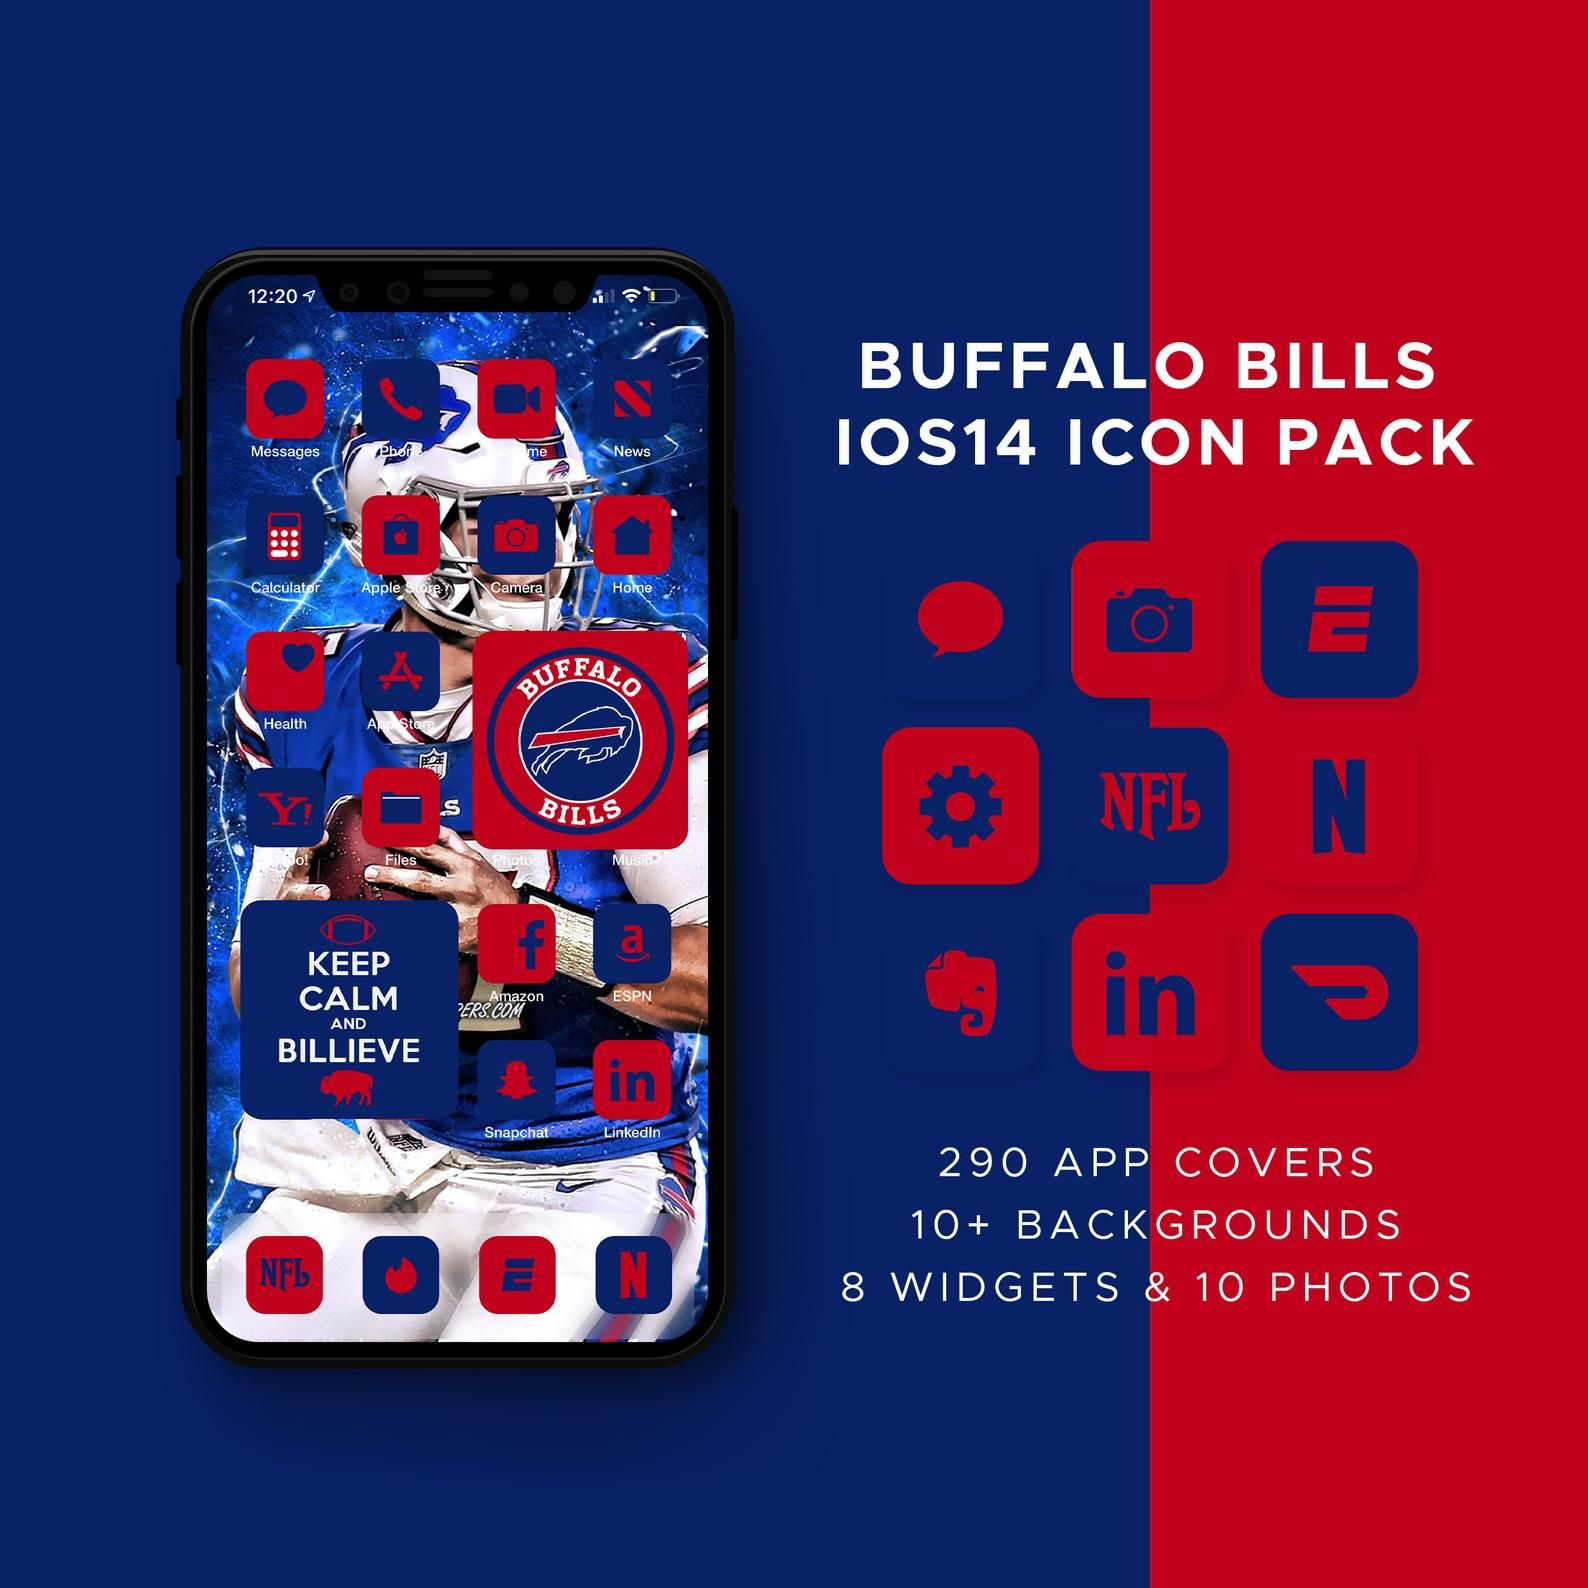 Buffalo Bills Ios14 Icon Theme Pack Ios14 Icons Bundle Ios Etsy In 2021 Buffalo Bills Ios14 Icon Icon